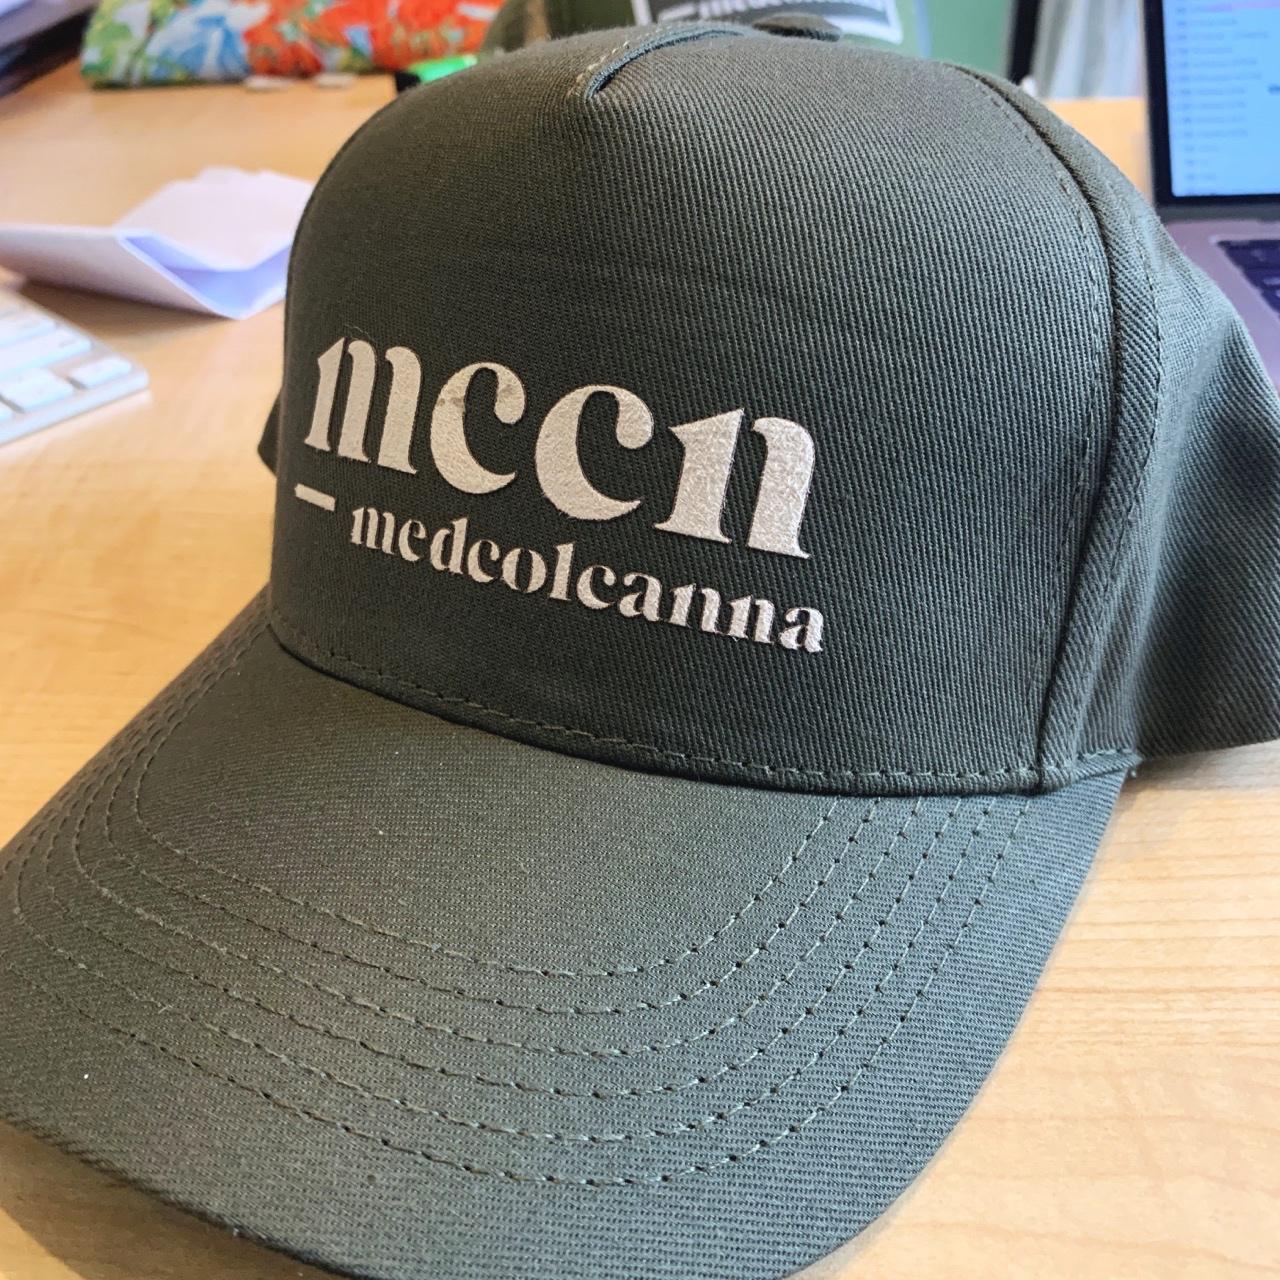 Cachucha Medcolcanna